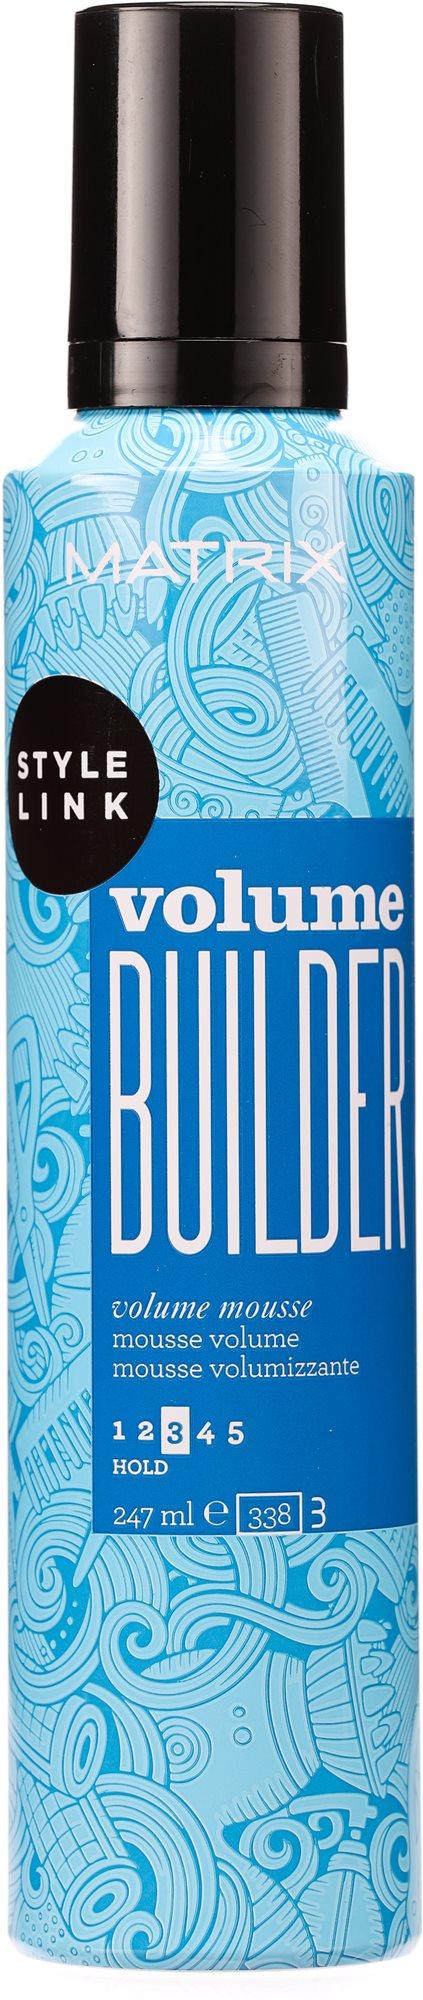 MATRIX Style Link Volume Builder Volume Mousse 250 ml